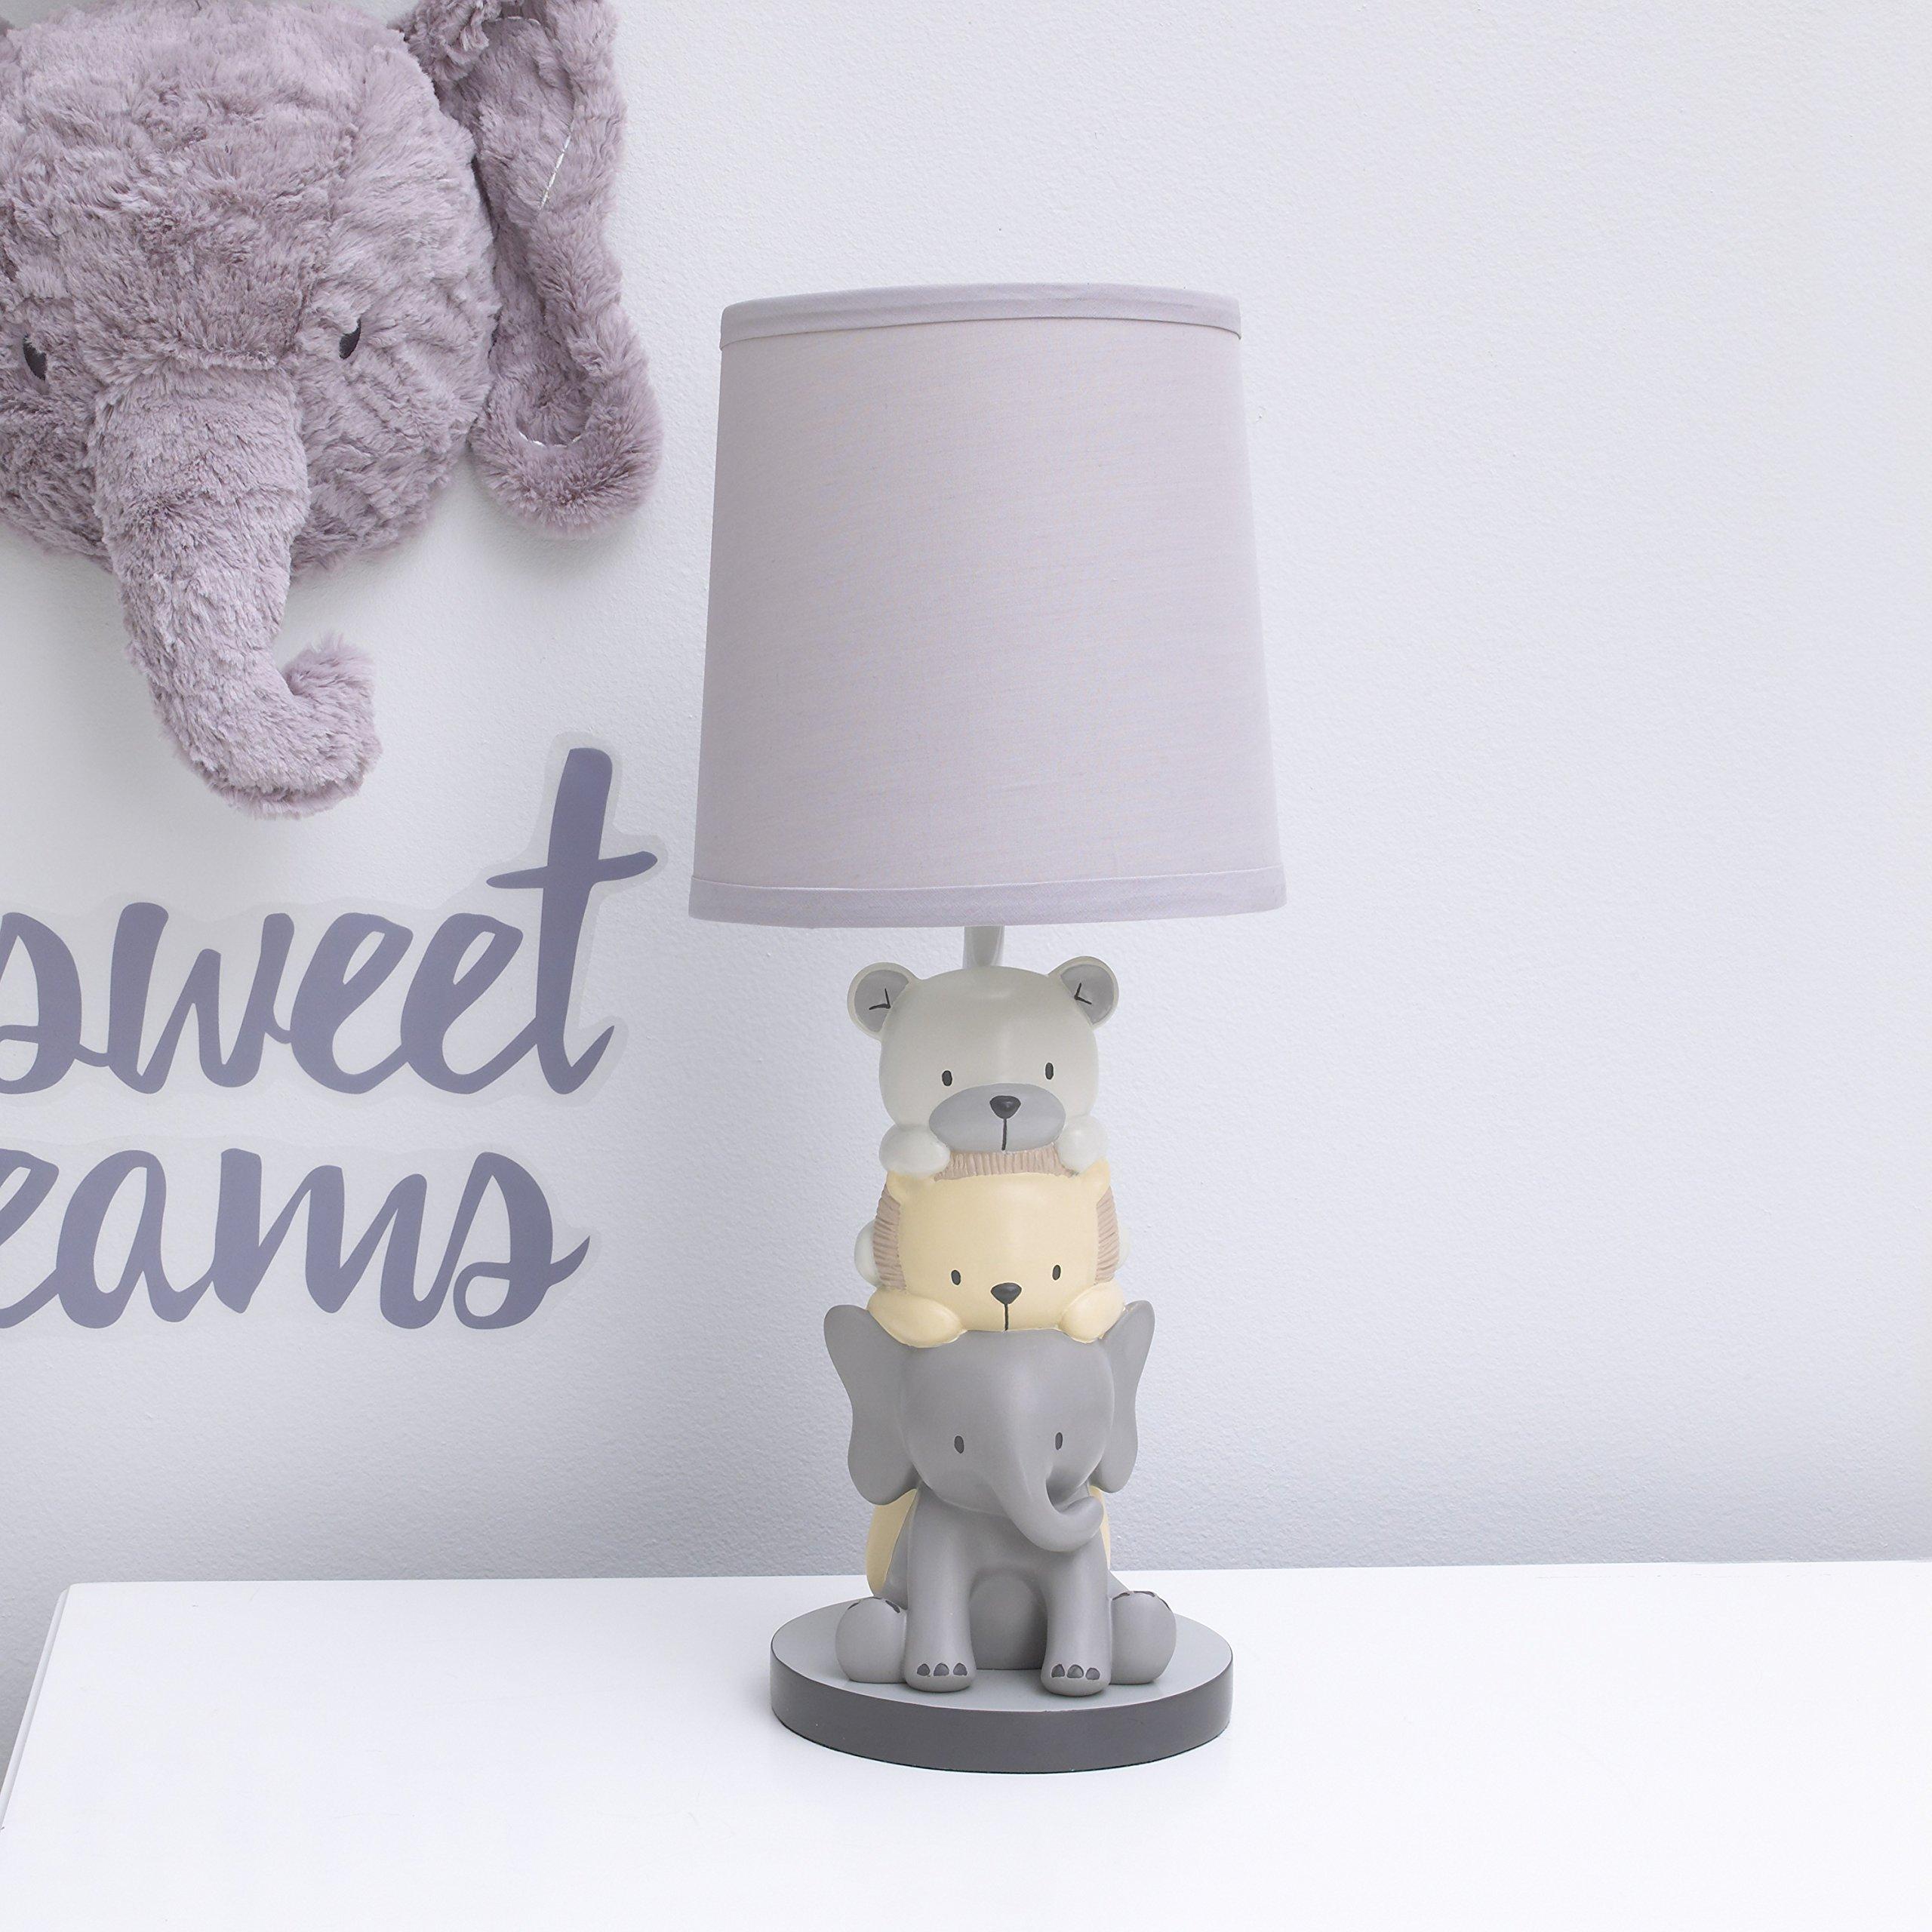 NoJo Play Day Pals Elephant/Animal Lamp Base and Shade, Grey, Cream, Charcoal